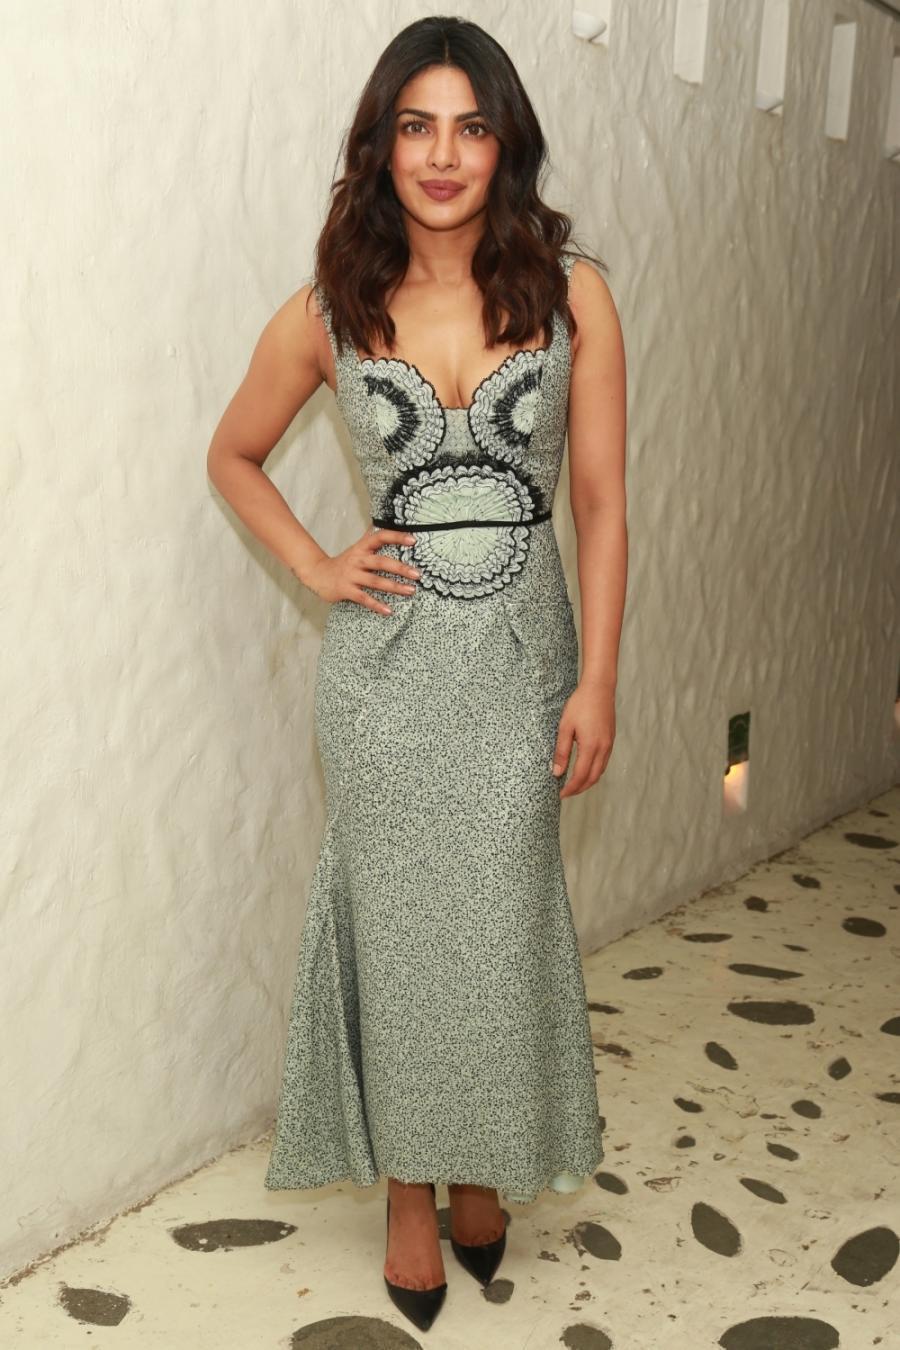 Priyanka Chopra Hot Looking Face Photos In Long Dress